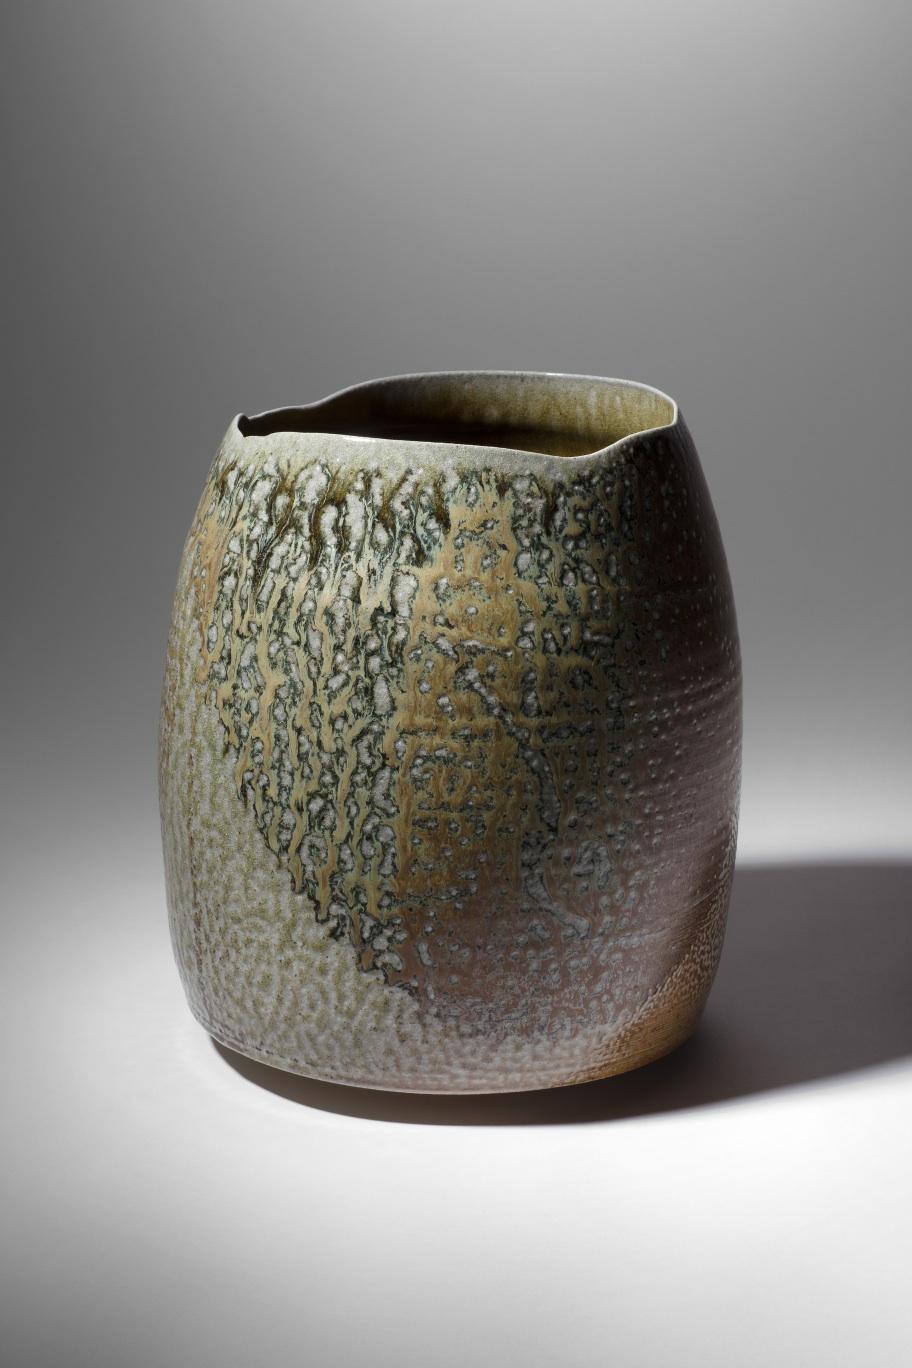 Mandy Parslow, MP03 Barrel Vessel, wood fired salt glazed stoneware, 27 x 22cm, EUR 800